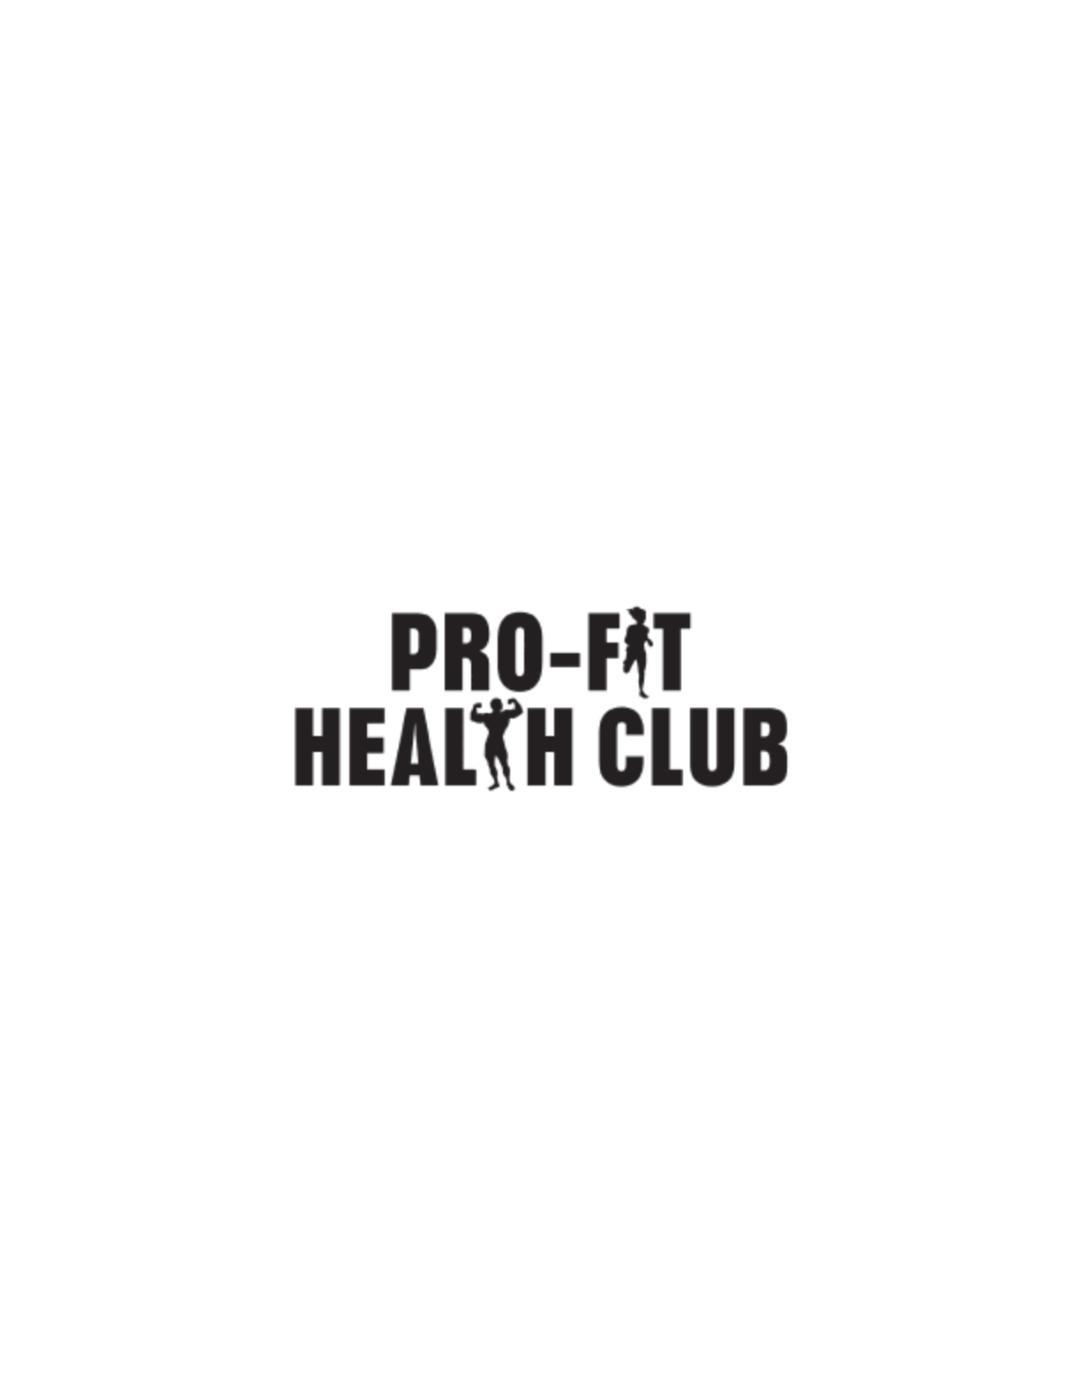 Pro-Fit Health Club